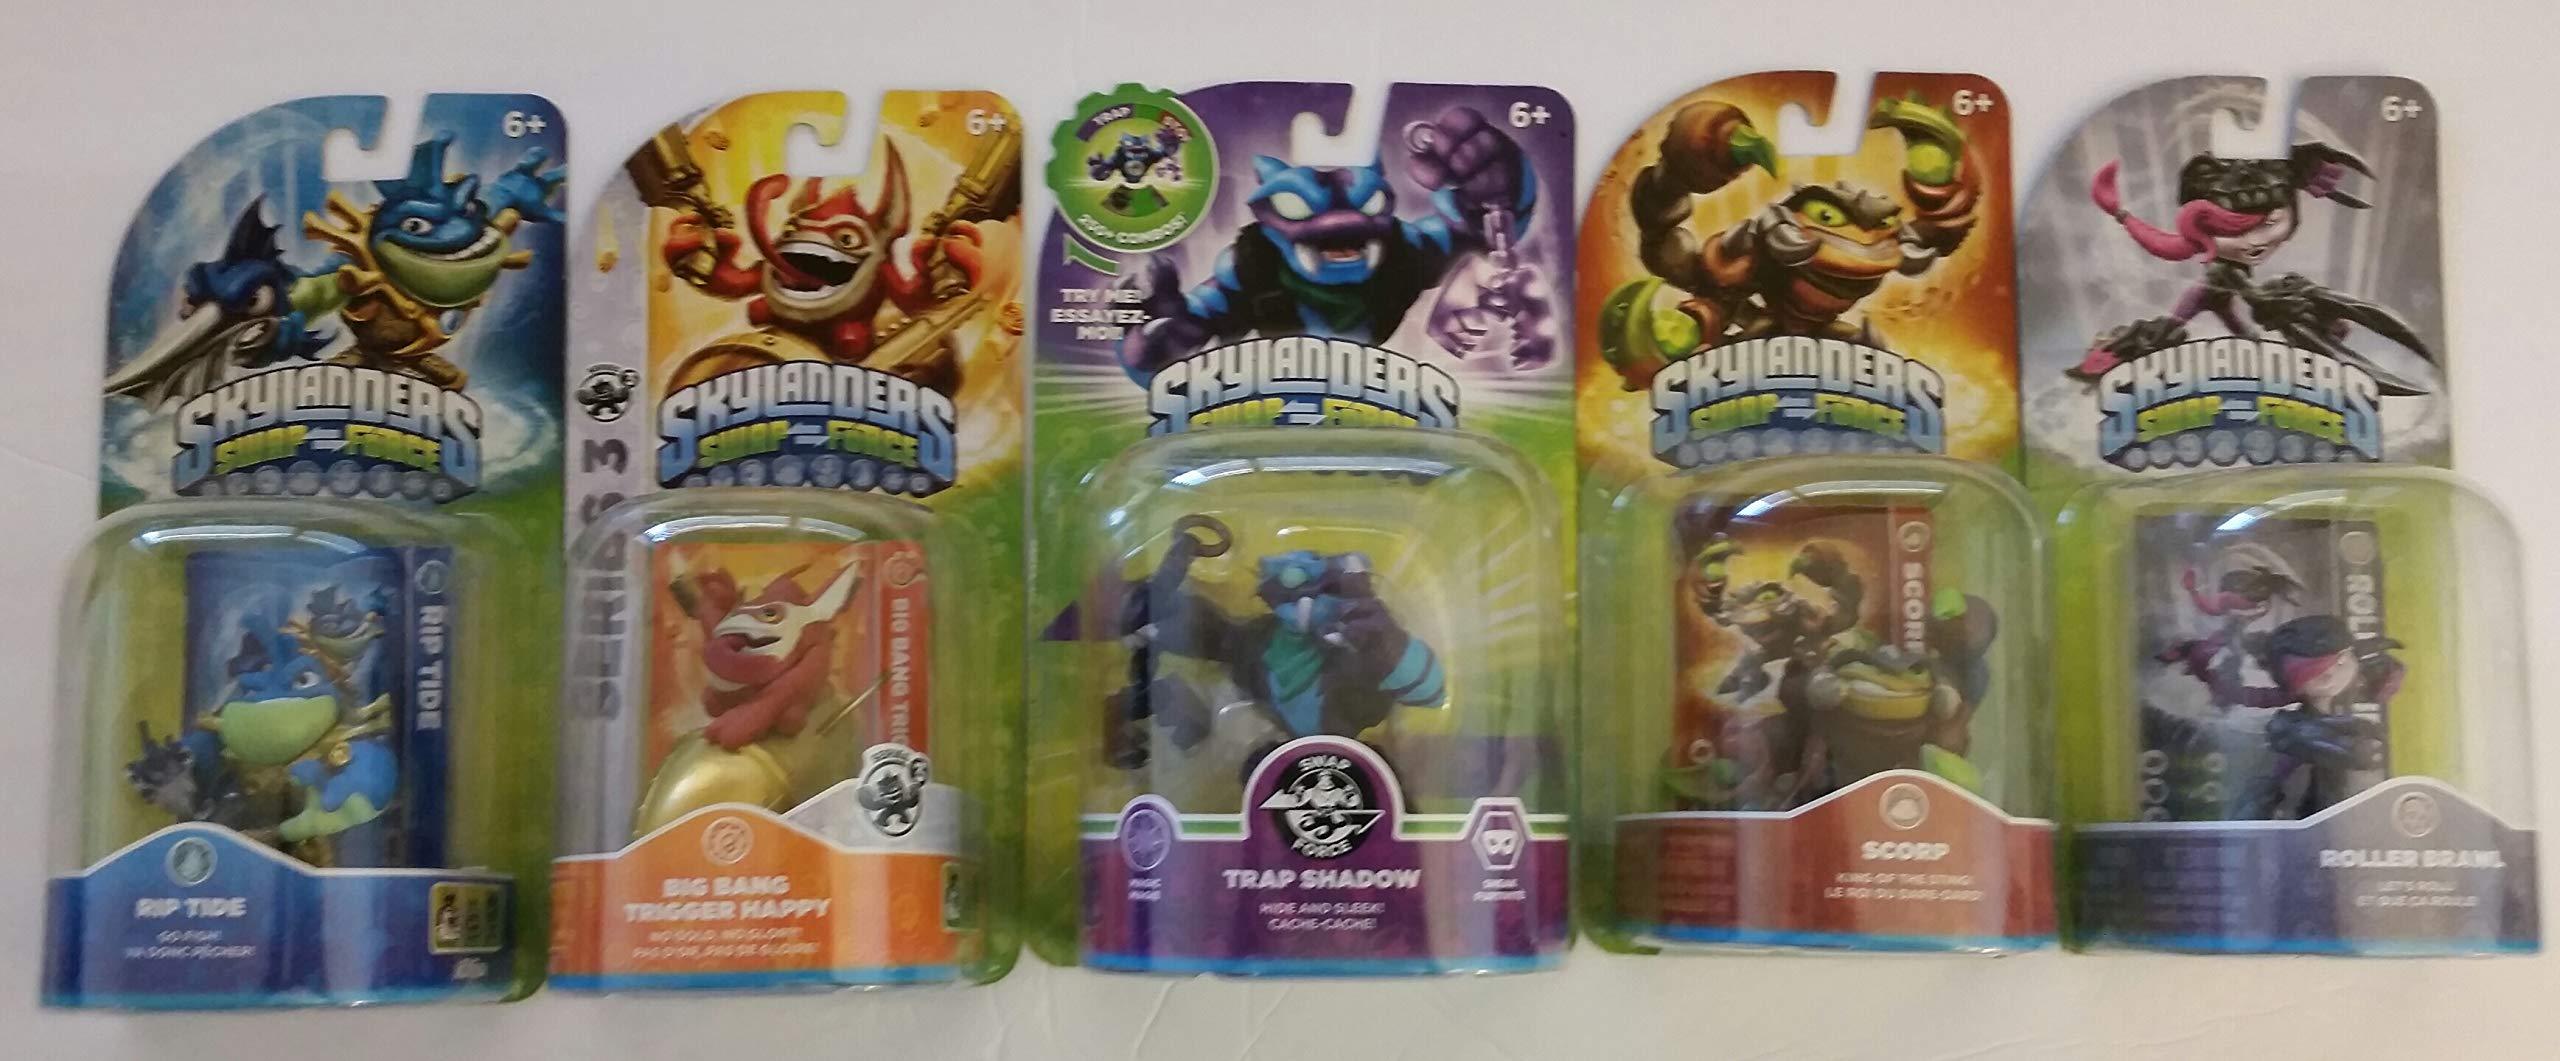 Skylanders Swap Force Action Figures (5) : Trap Shadow , Rip Tide , Roller Brawl, Scorp and Big Bang Trigger Happy